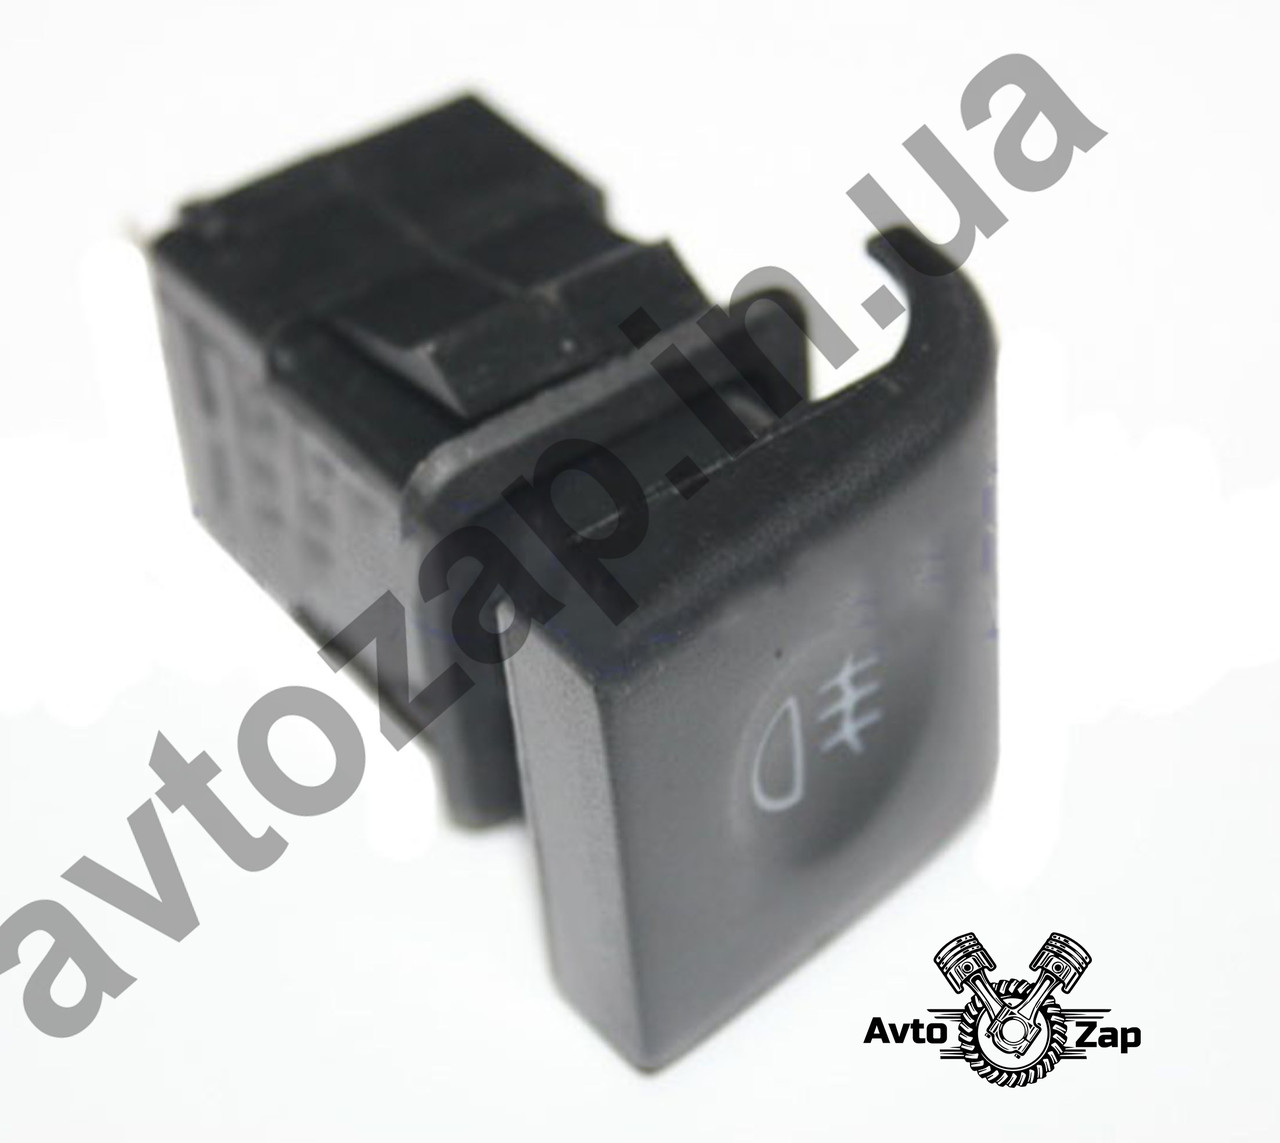 Кнопка противотуманных фар  ВАЗ 2110задних.  47665